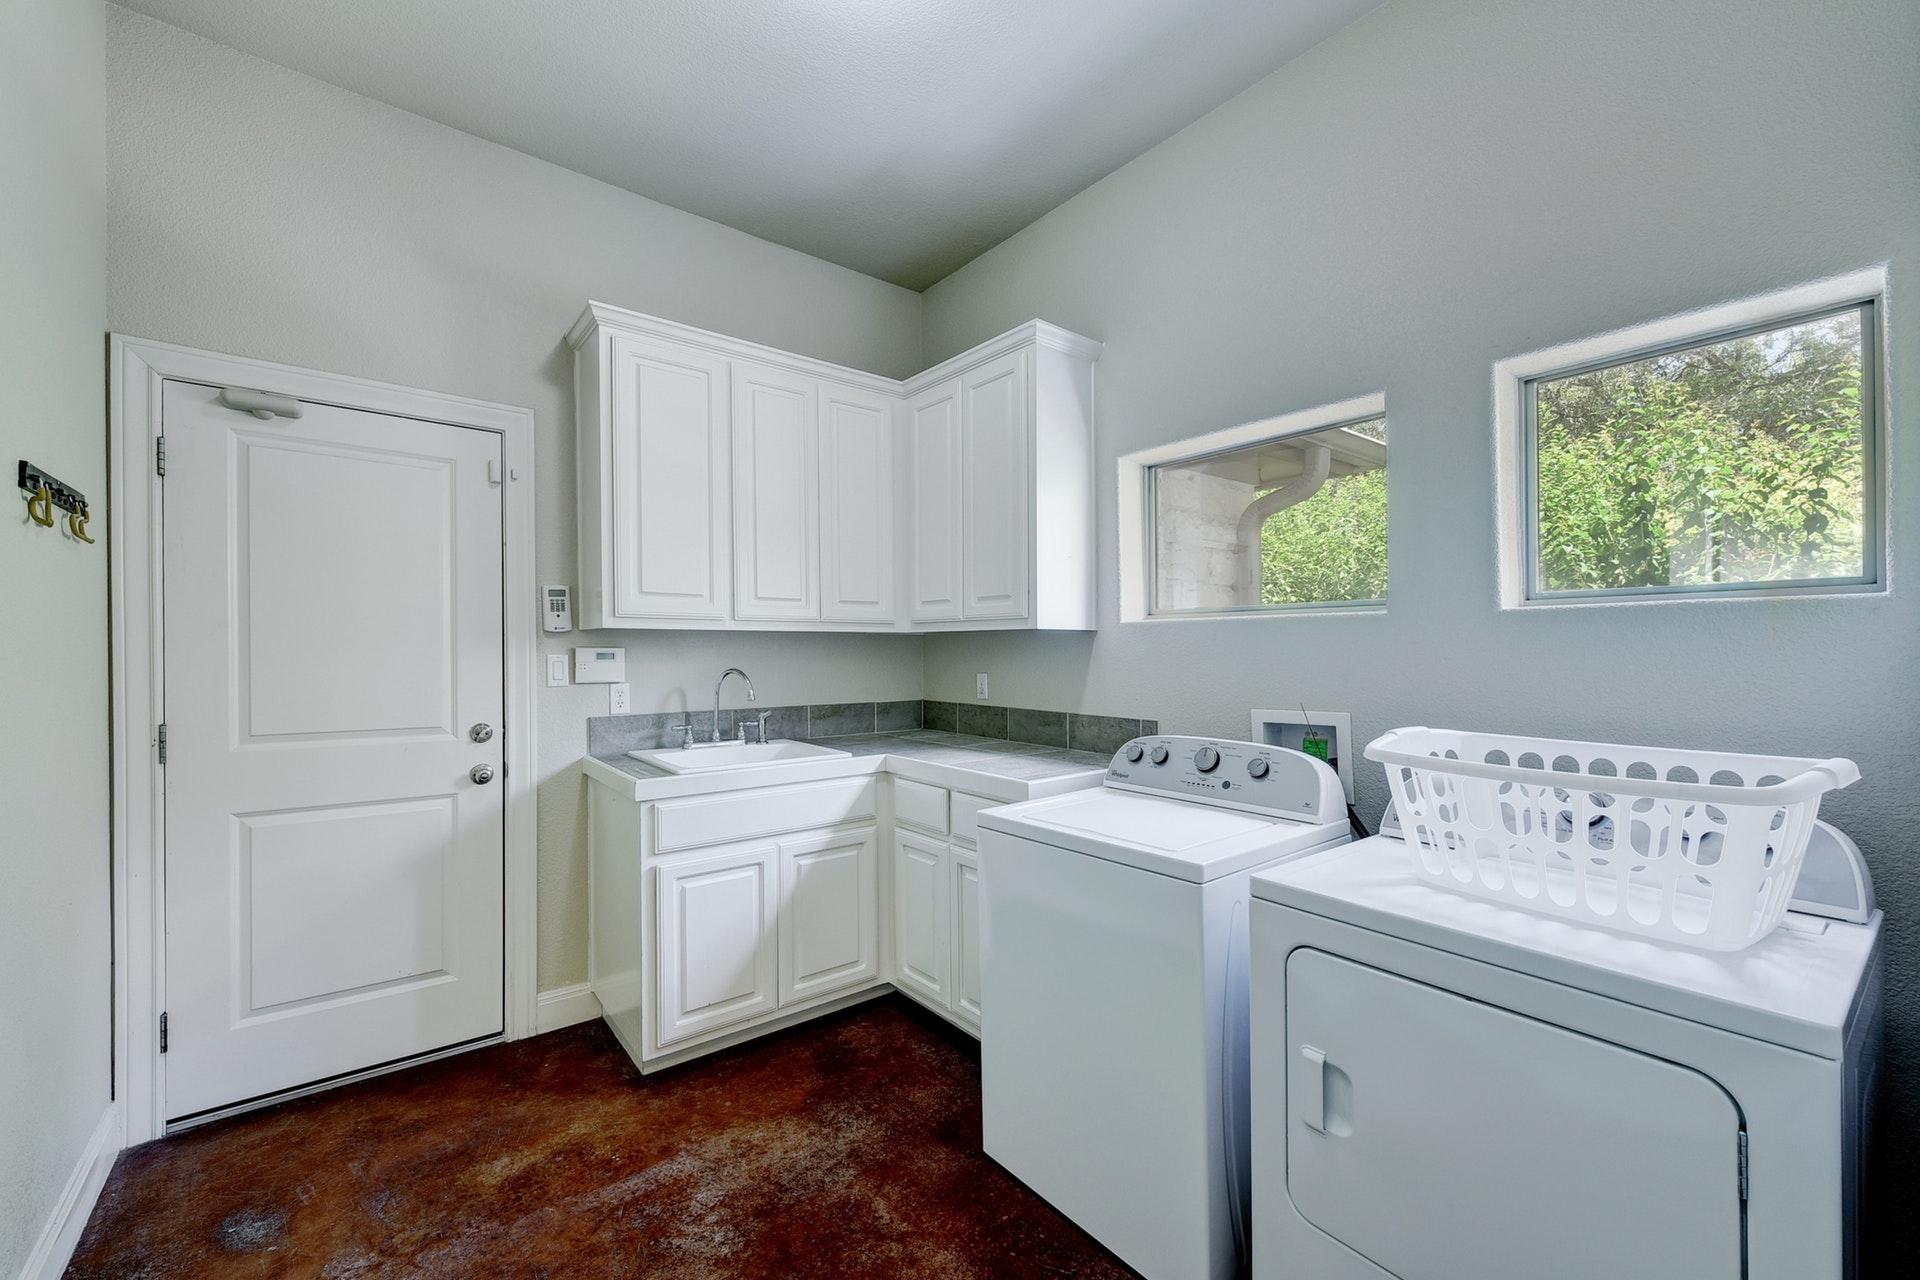 1014 Ogden Drive - Laundry Room